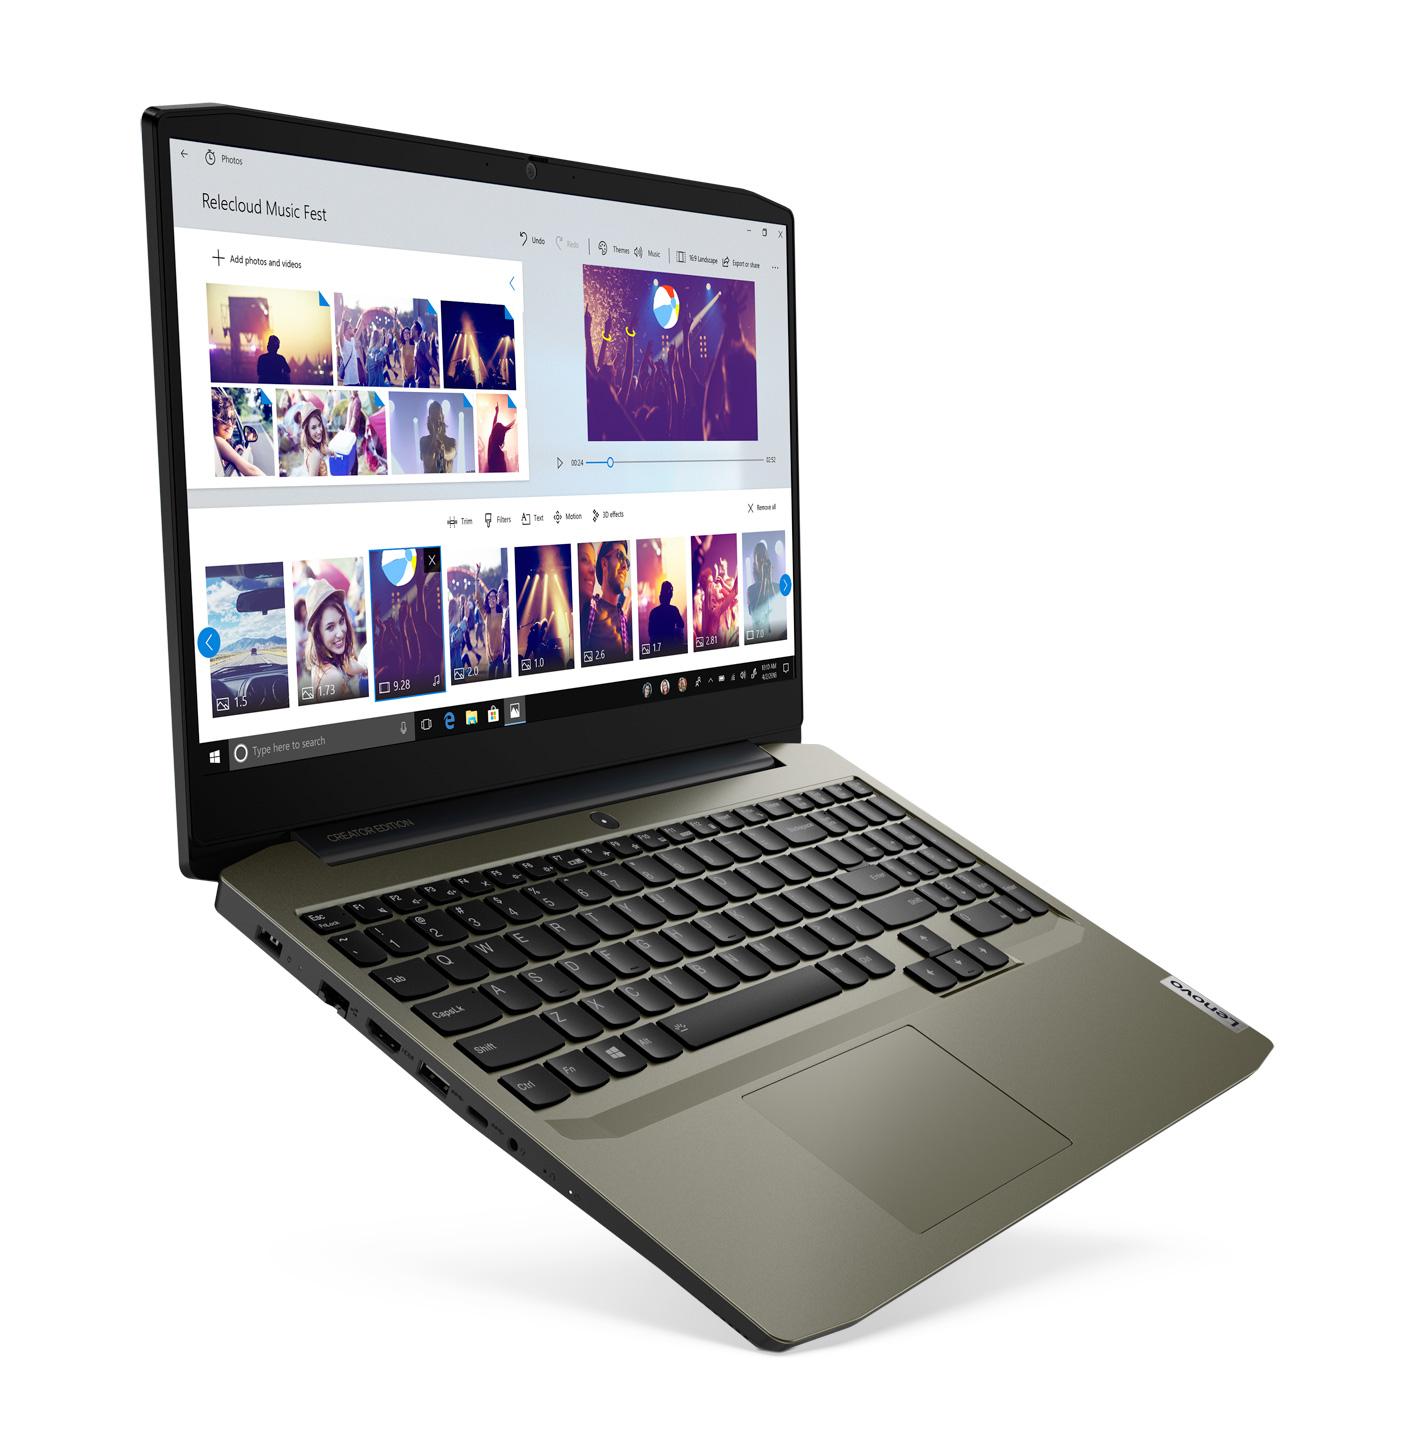 "[Étudiants] PC portable 15.6"" full HD Lenovo IdeaPad Creator 5i - i5-10300H, GTX-1650 (4 Go), 16 Go de RAM, 256 Go en SSD, Windows 10"